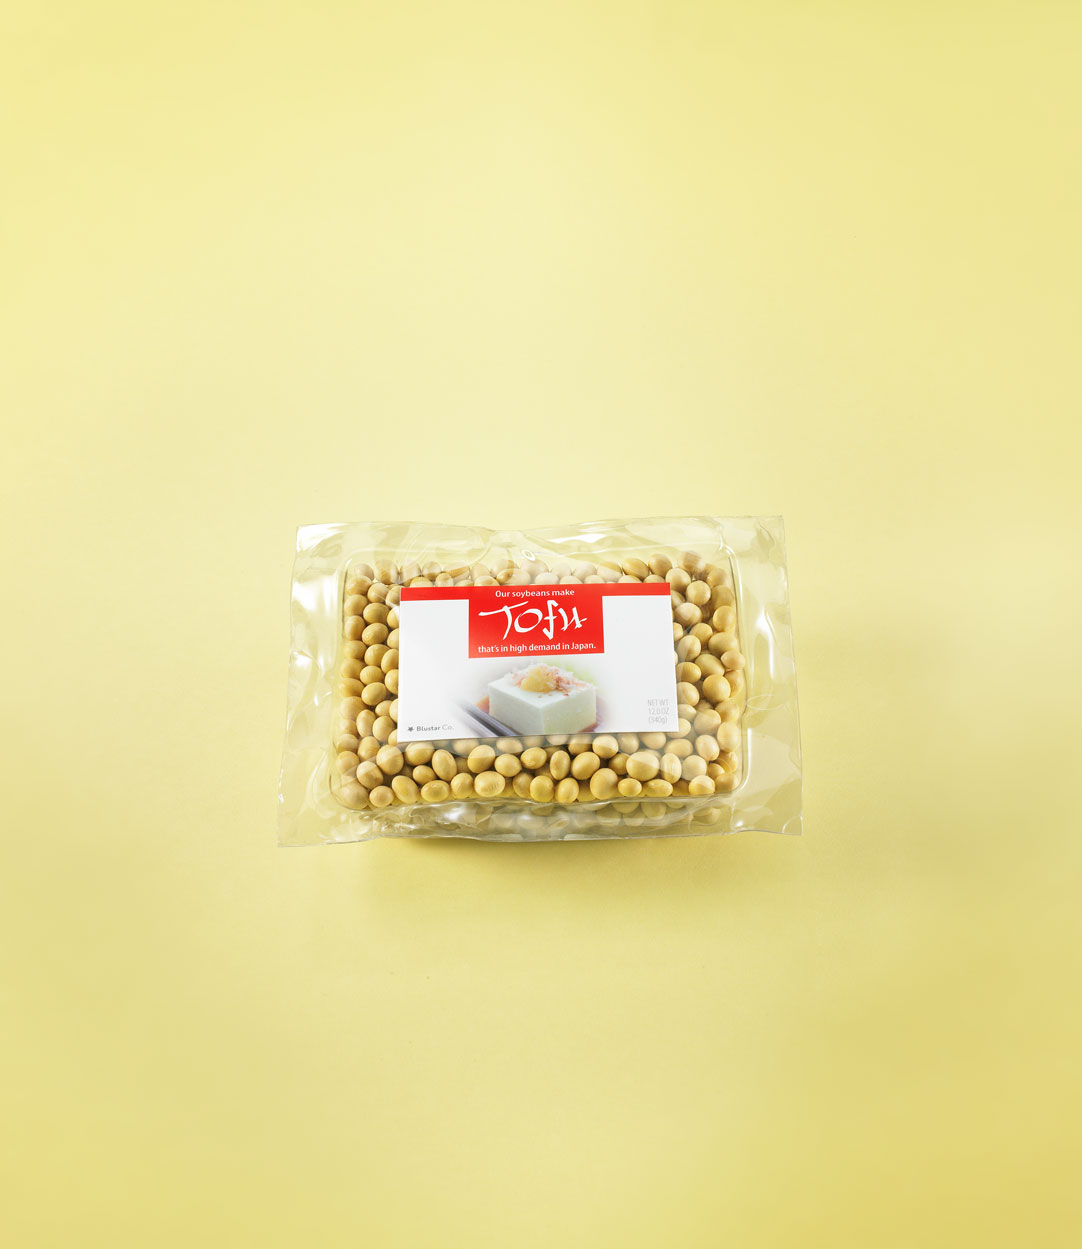 Syngenta-Soy-Bean.jpg